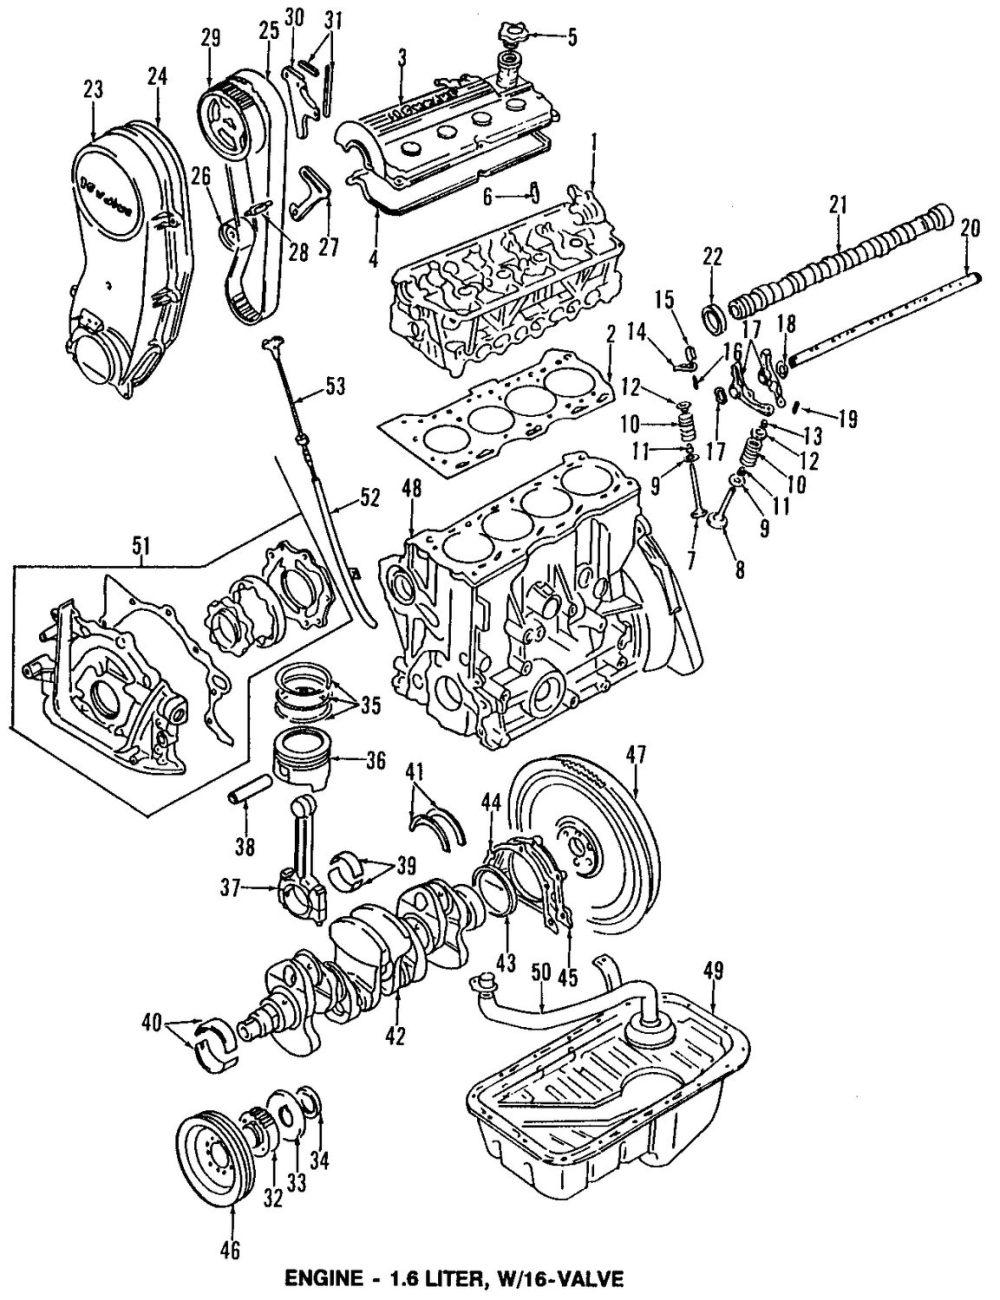 medium resolution of 1988 suzuki samurai engine diagram wiring diagram expert 96 suzuki samurai engine diagram